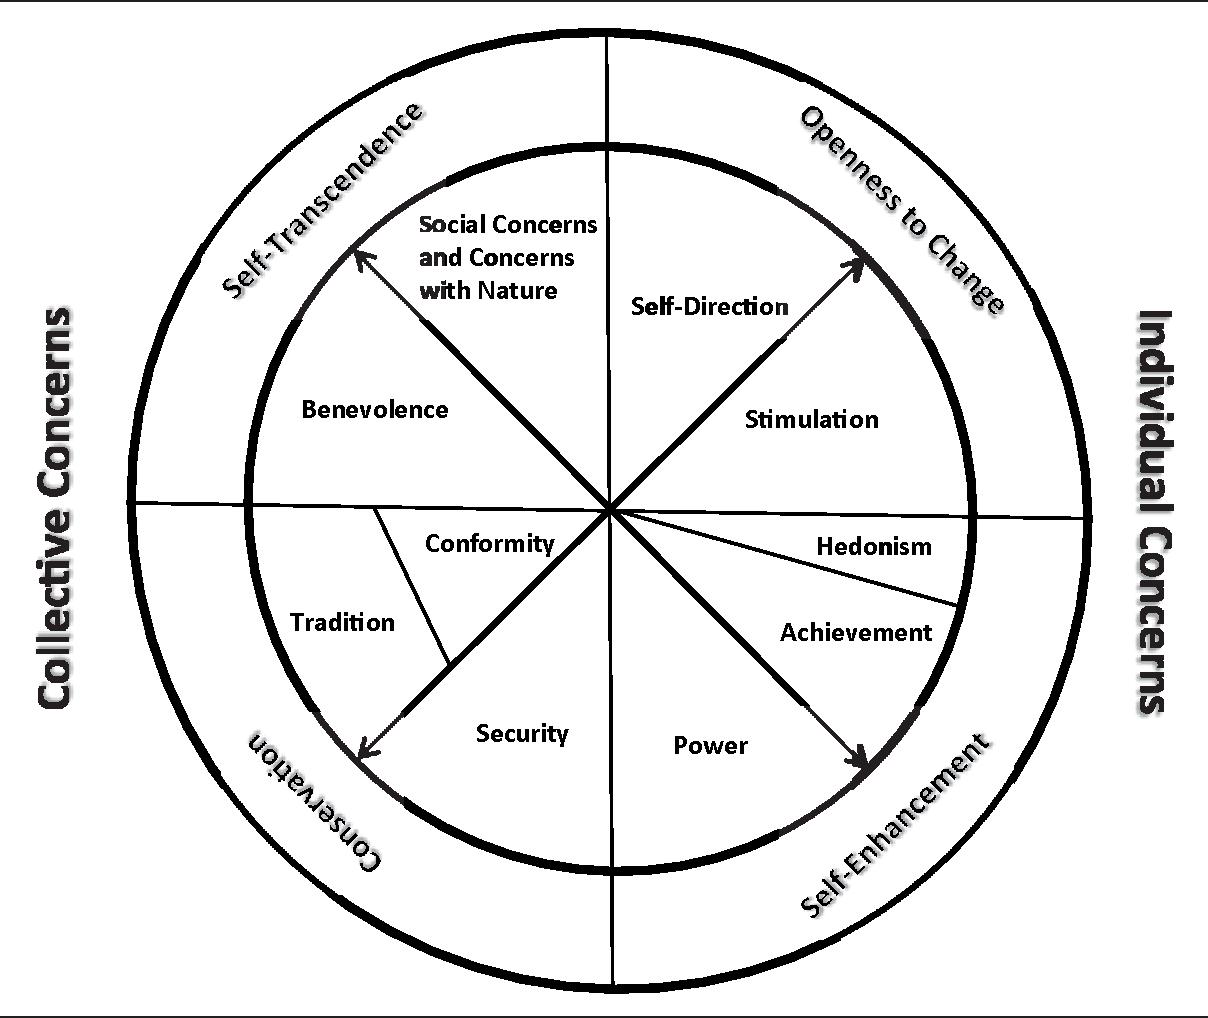 [PDF] Brand Concepts as Representations of Human Values